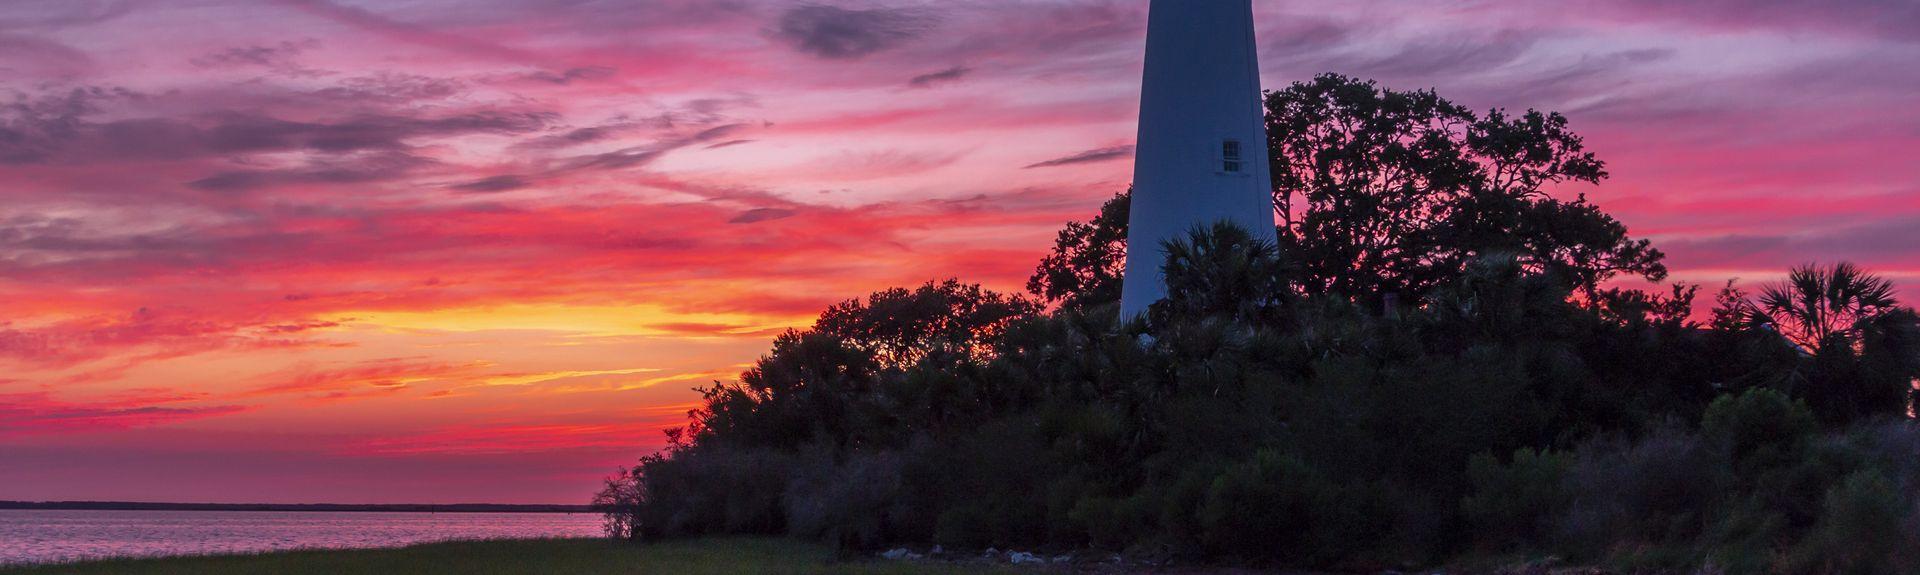 Crawfordville, FL, USA